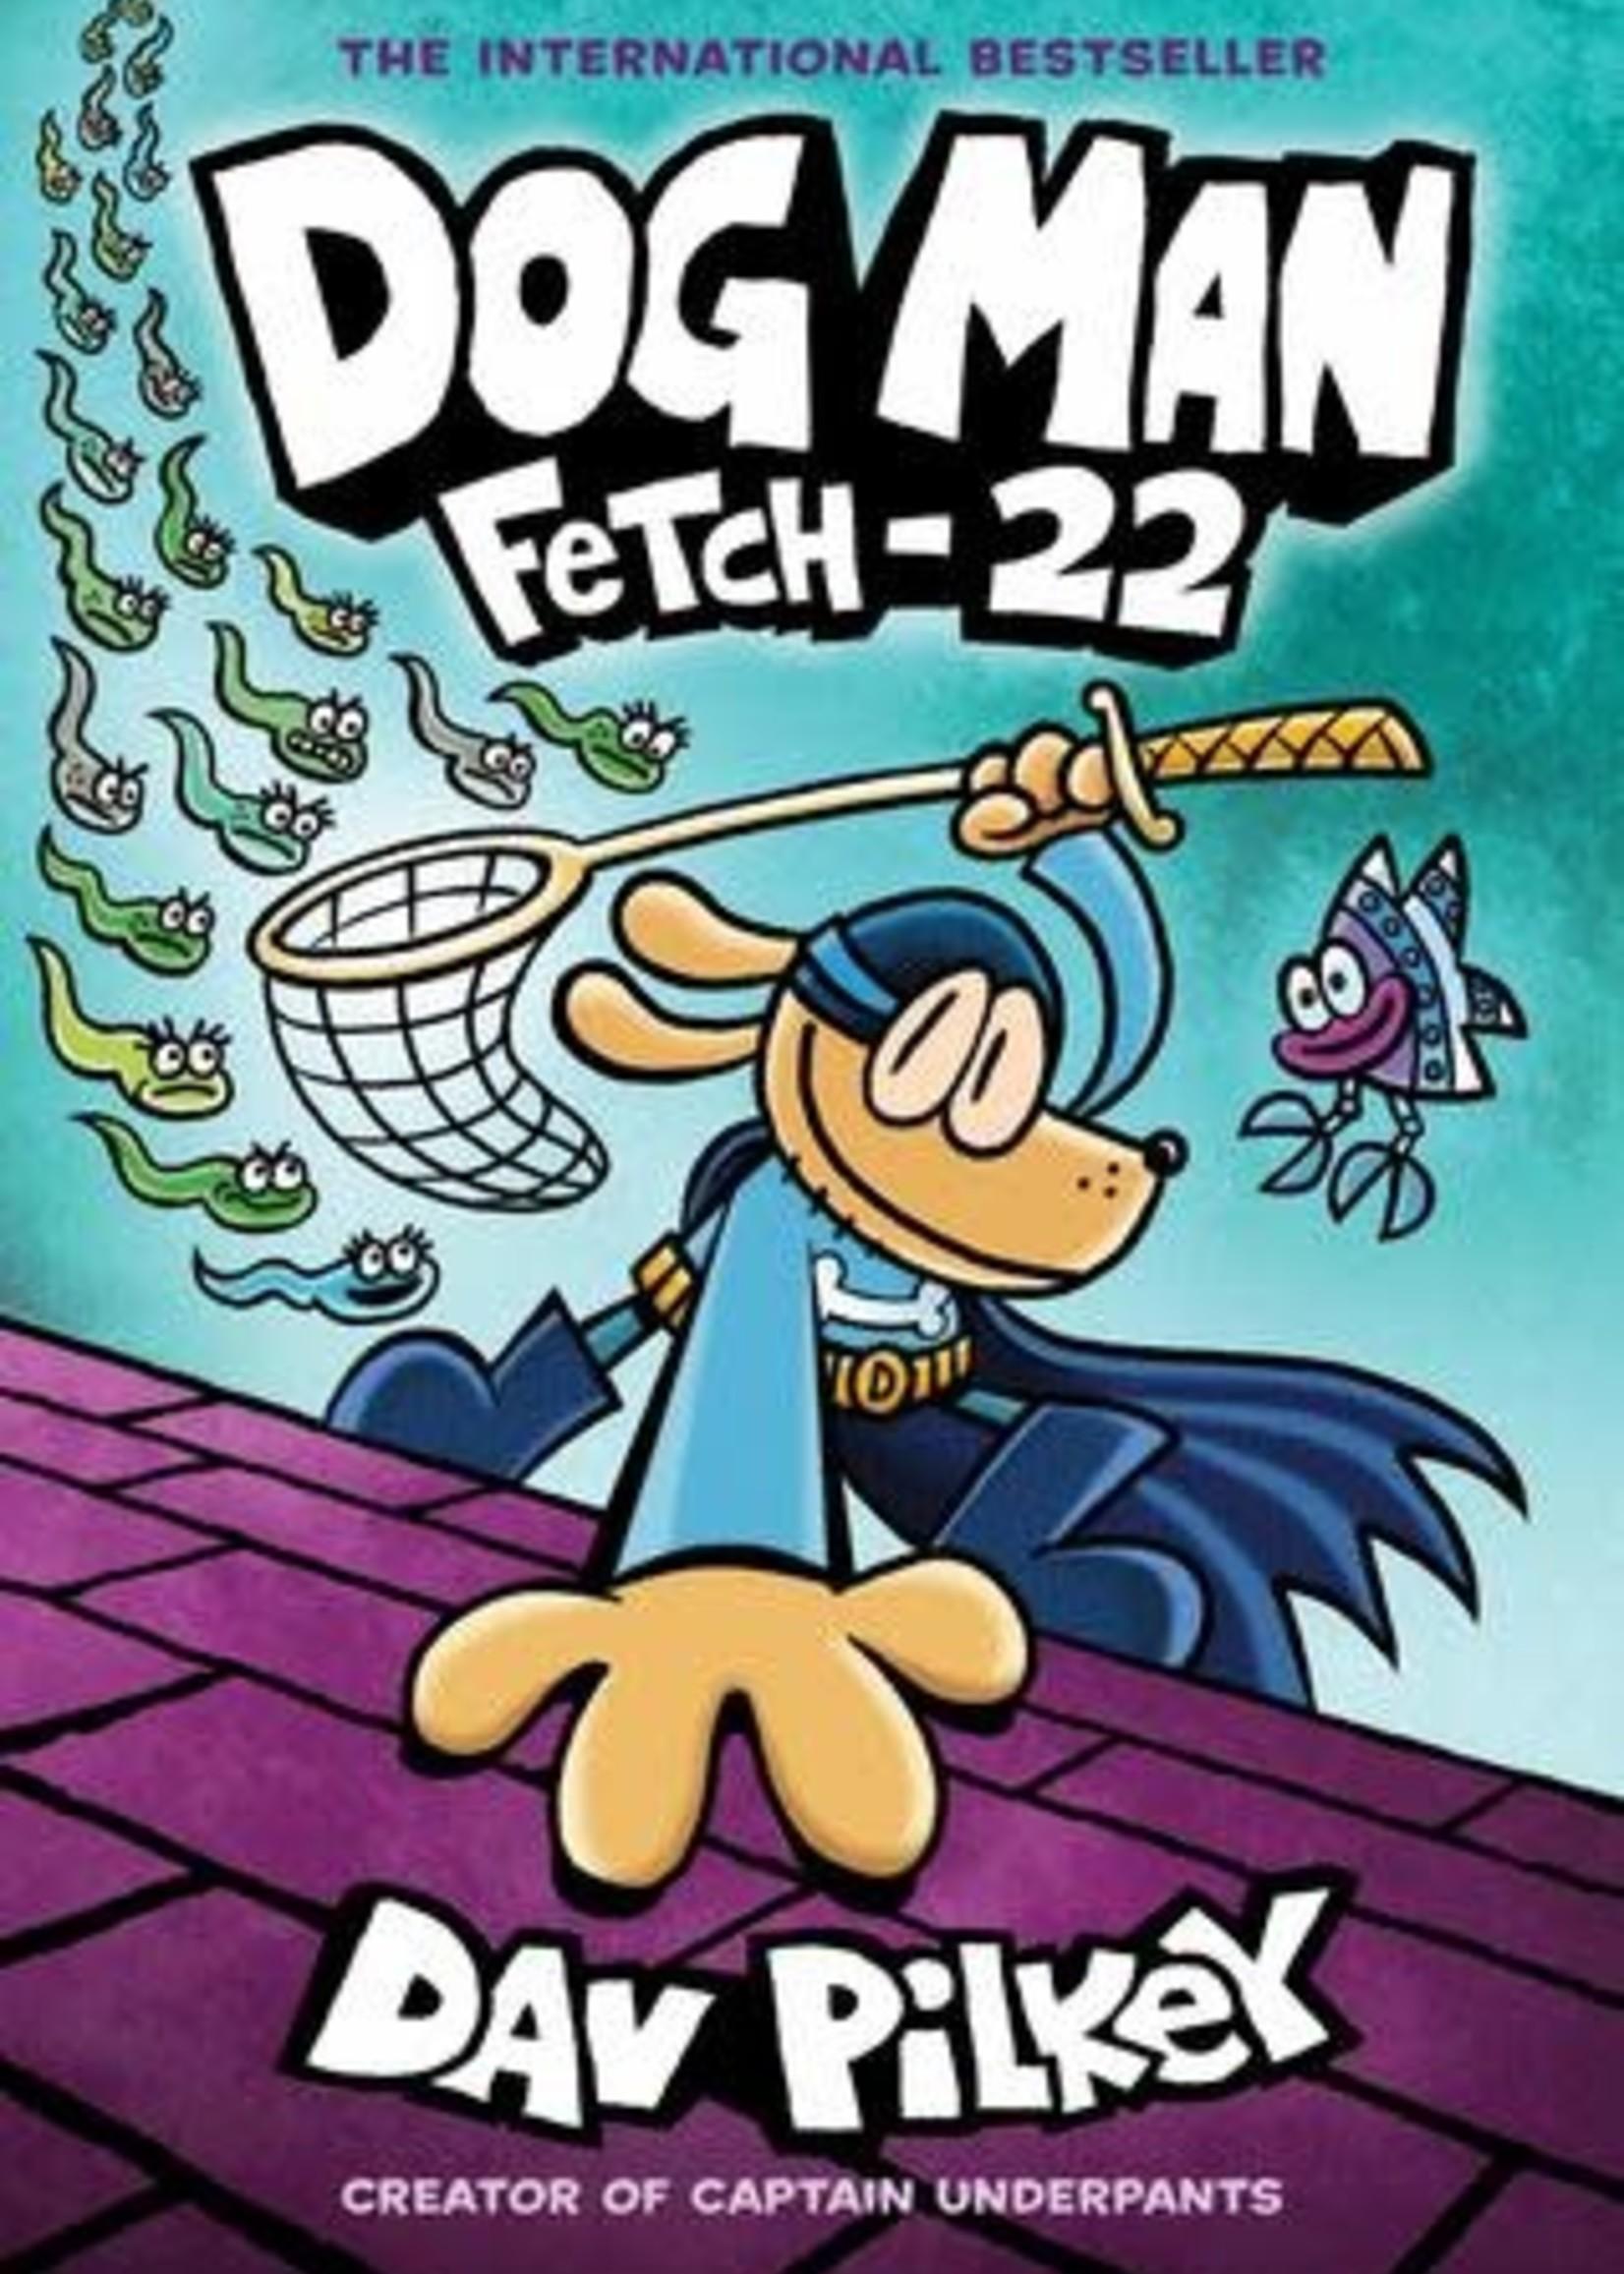 Dog Man: Fetch-22 (Dog Man #8) by Dav Pilkey